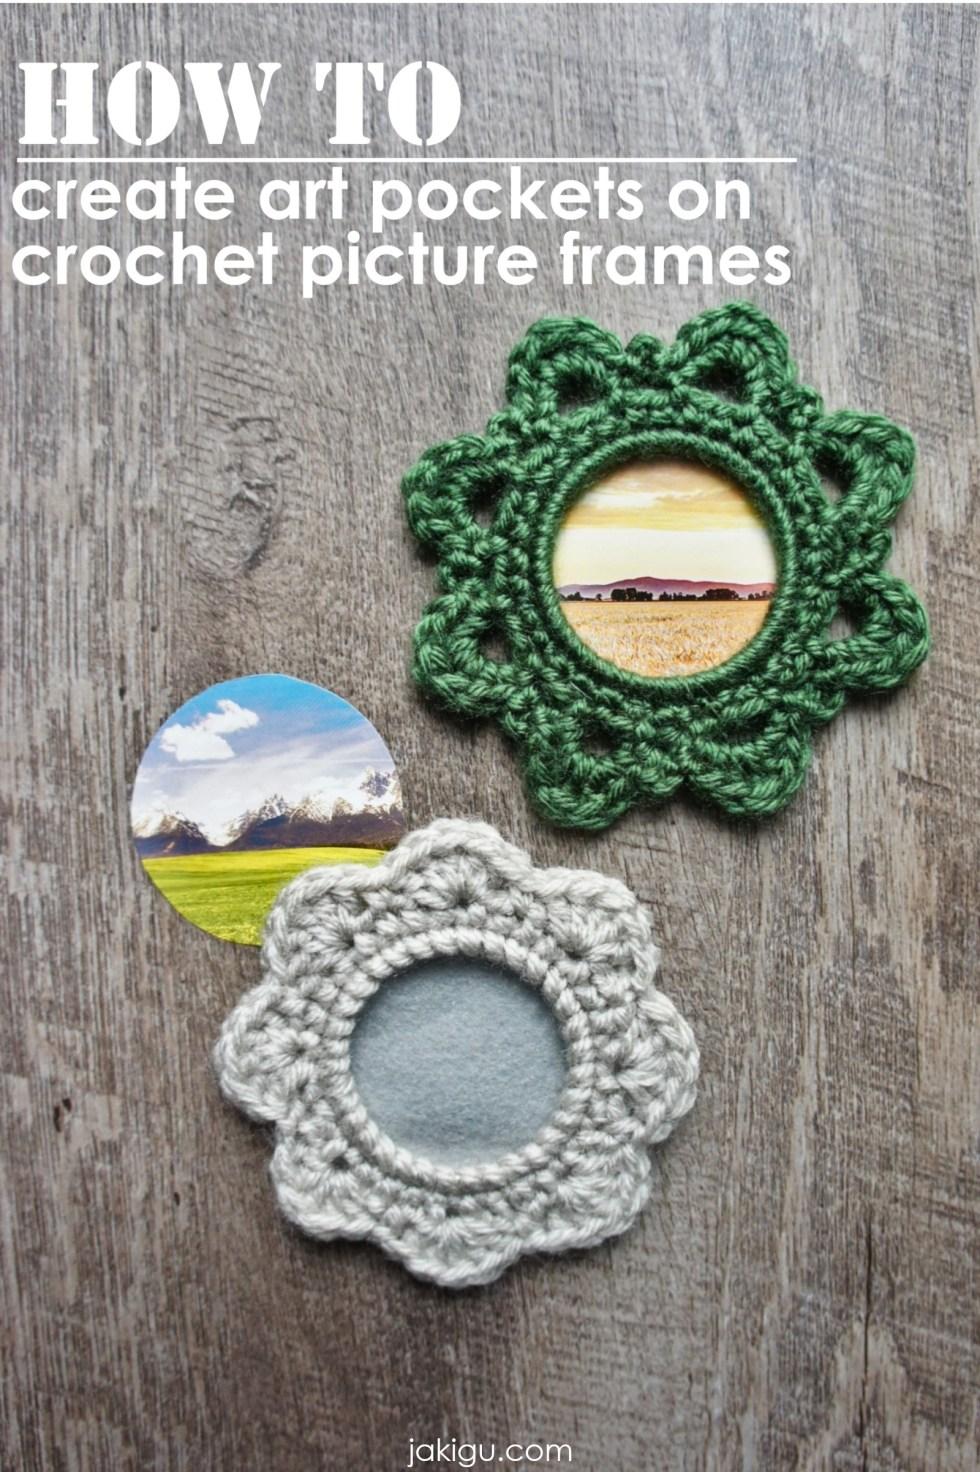 How to create art pockets on crochet picture frames | jakigu.com